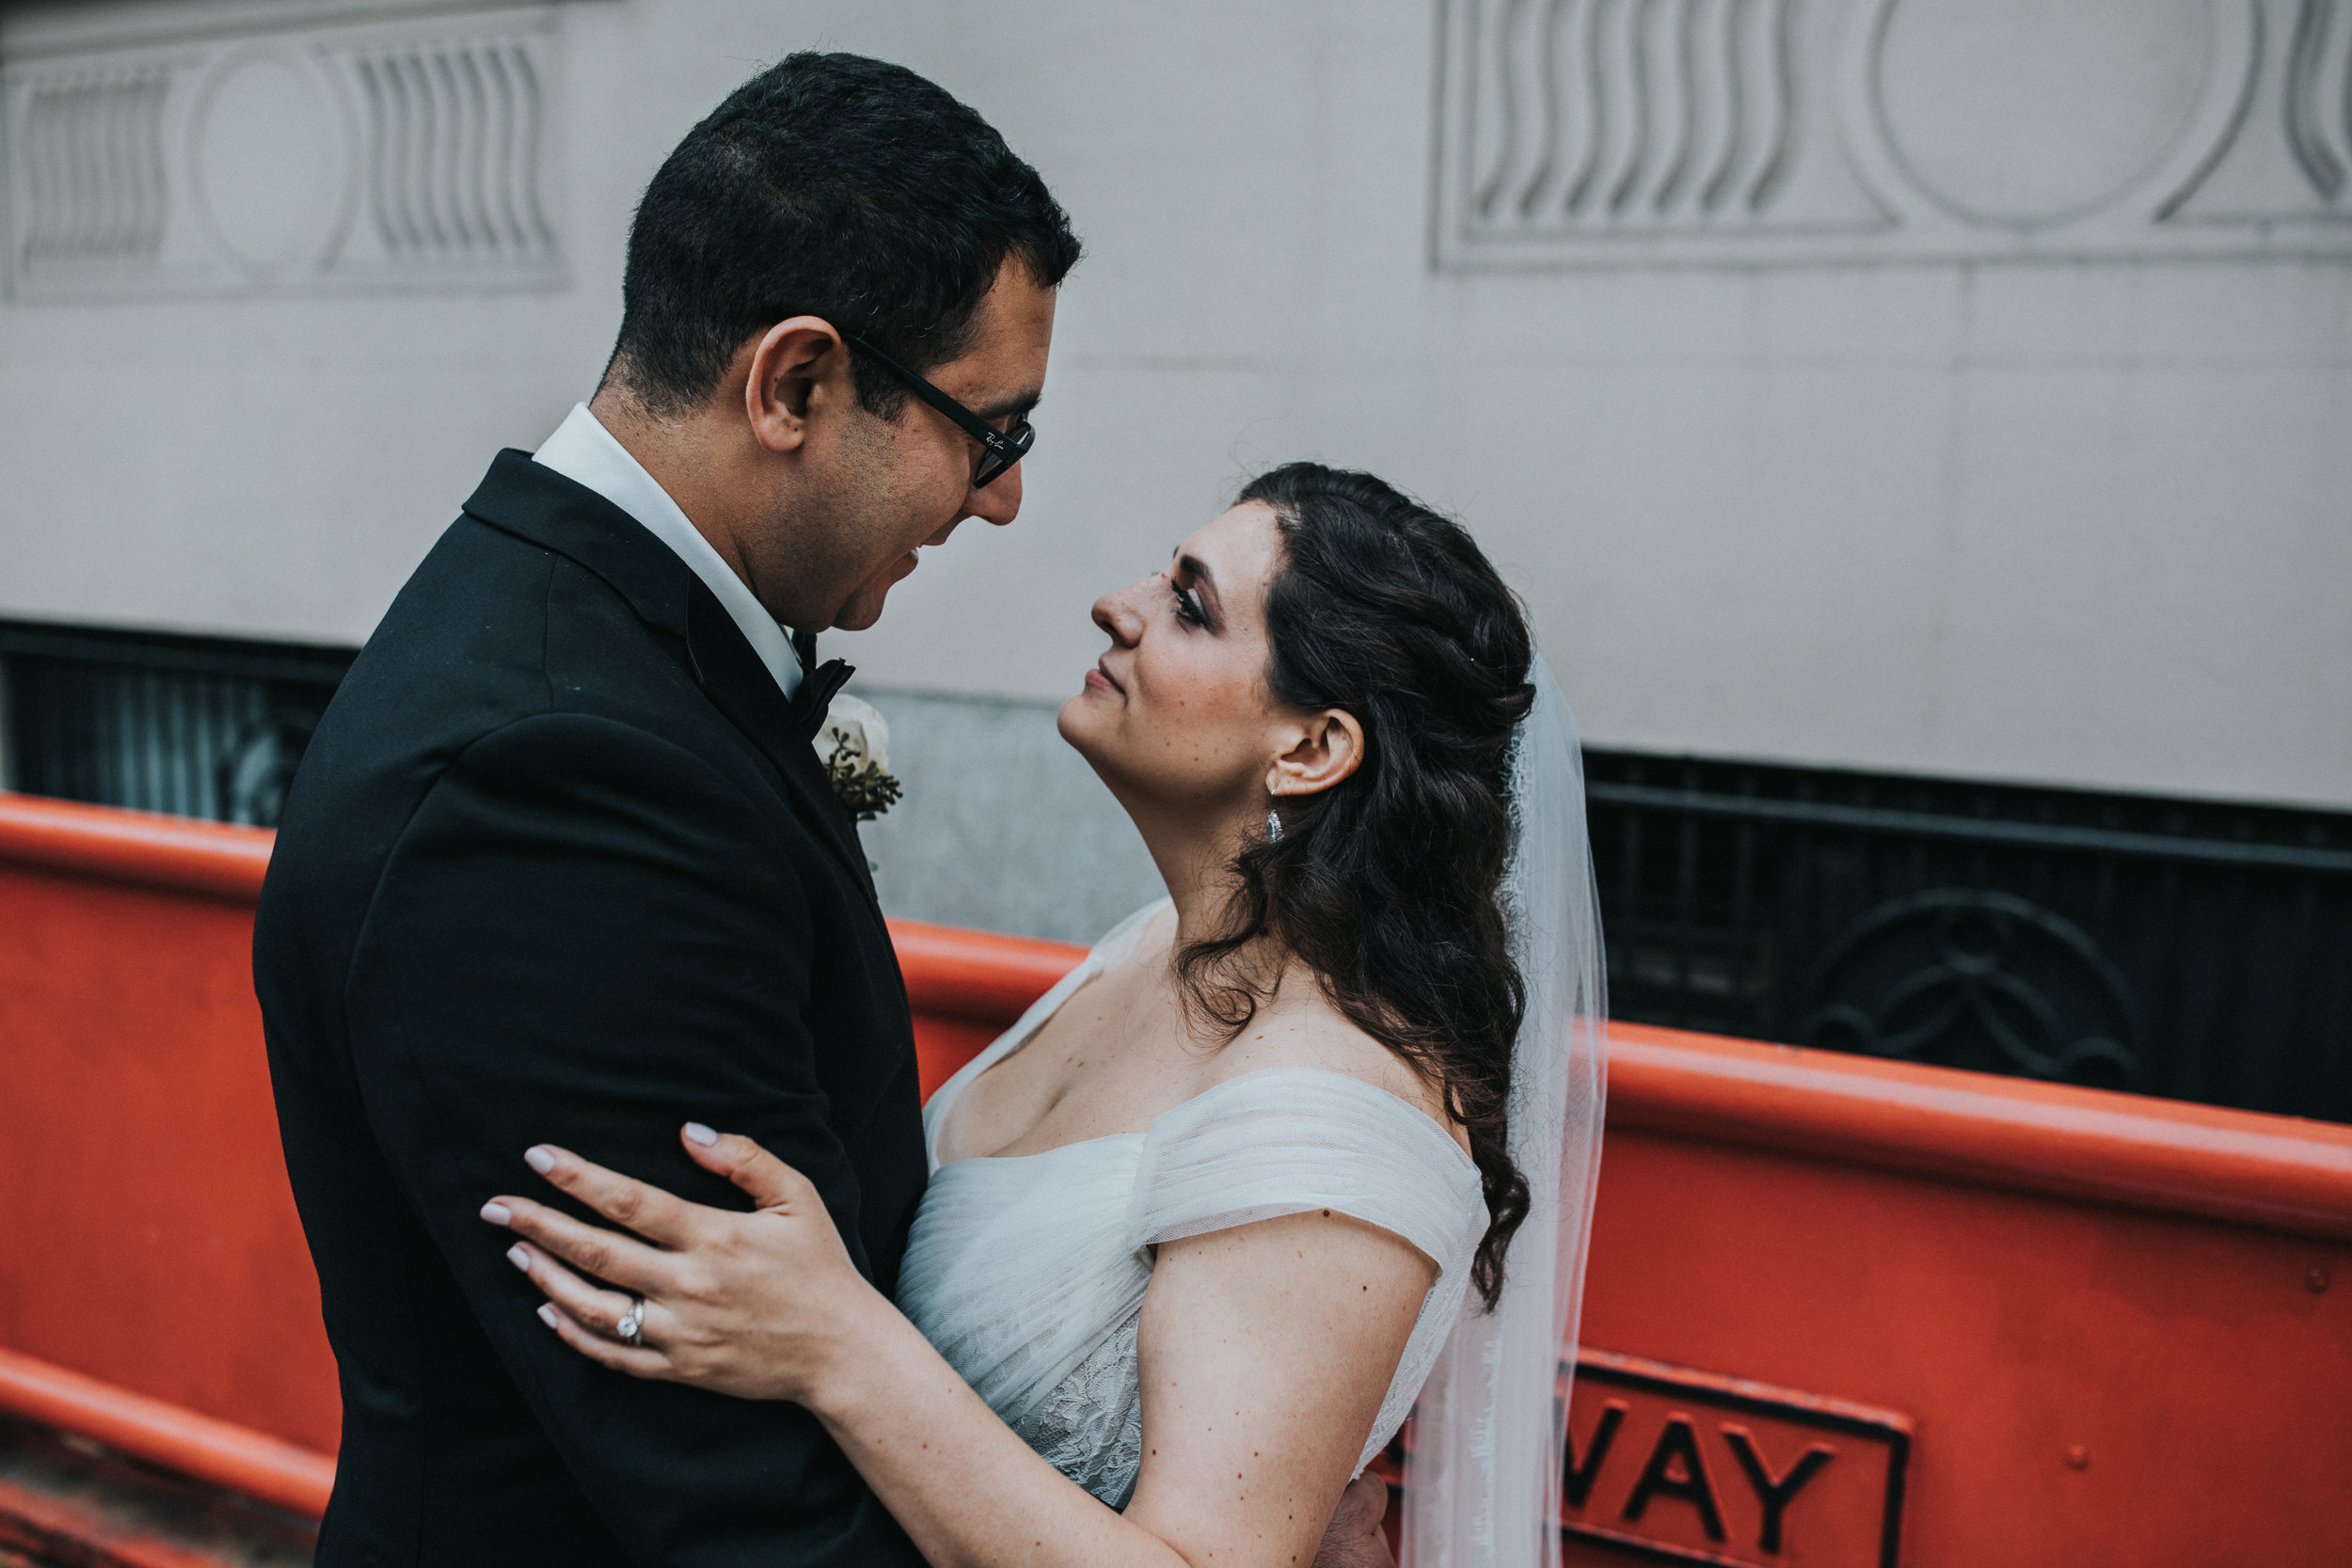 JennaLynnPhotography-NJWeddingPhotographer-Philadelphia-Wedding-ArtsBallroom-BridalParty-49.jpg